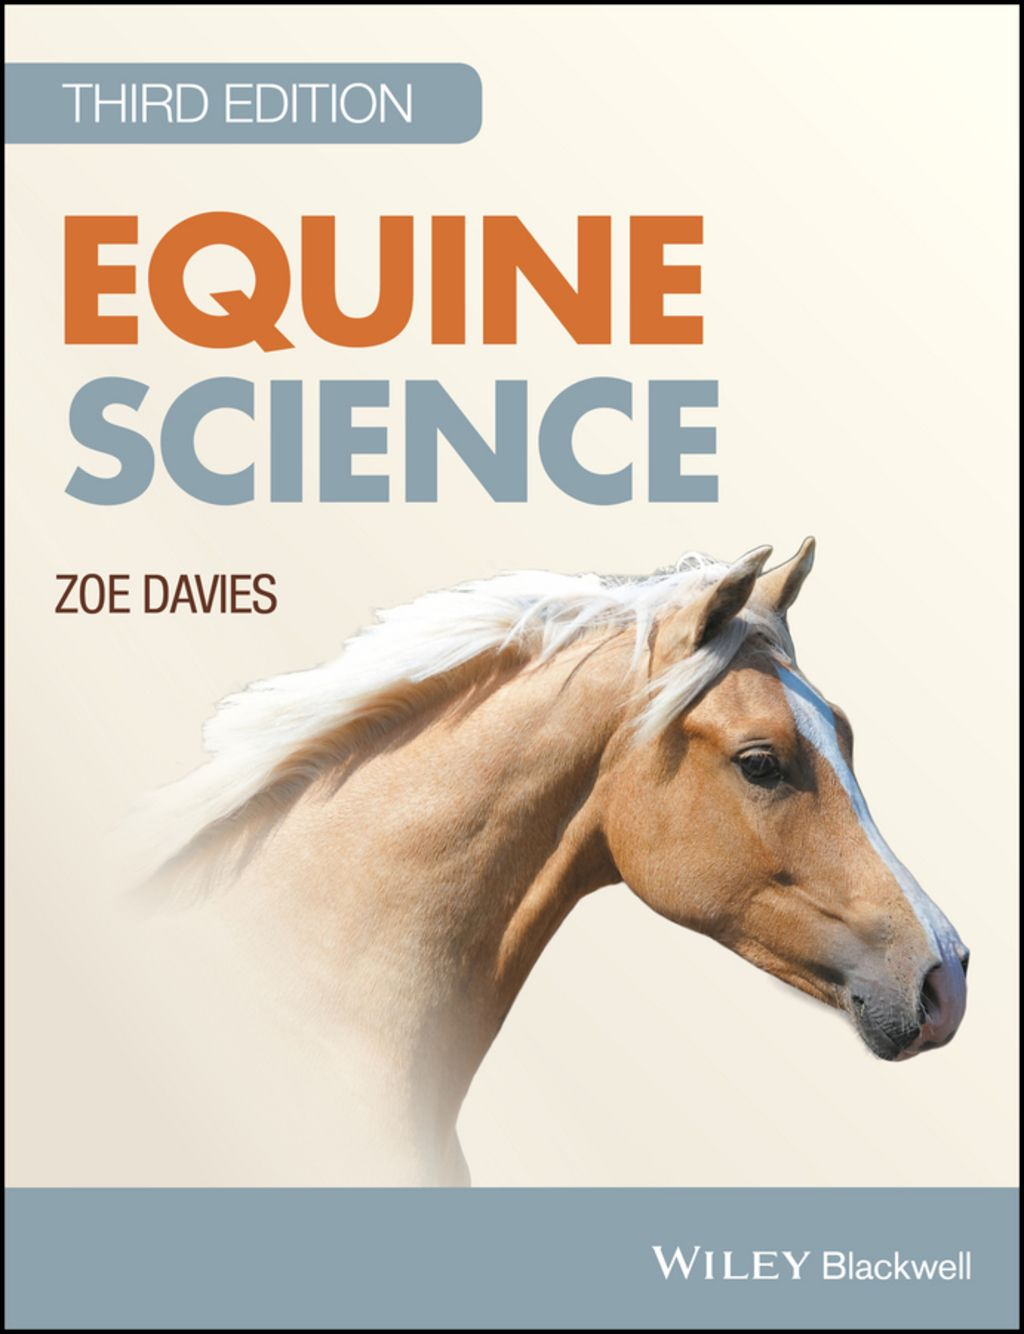 Equine Science Ebook In 2020 Science Science Books Science Programs